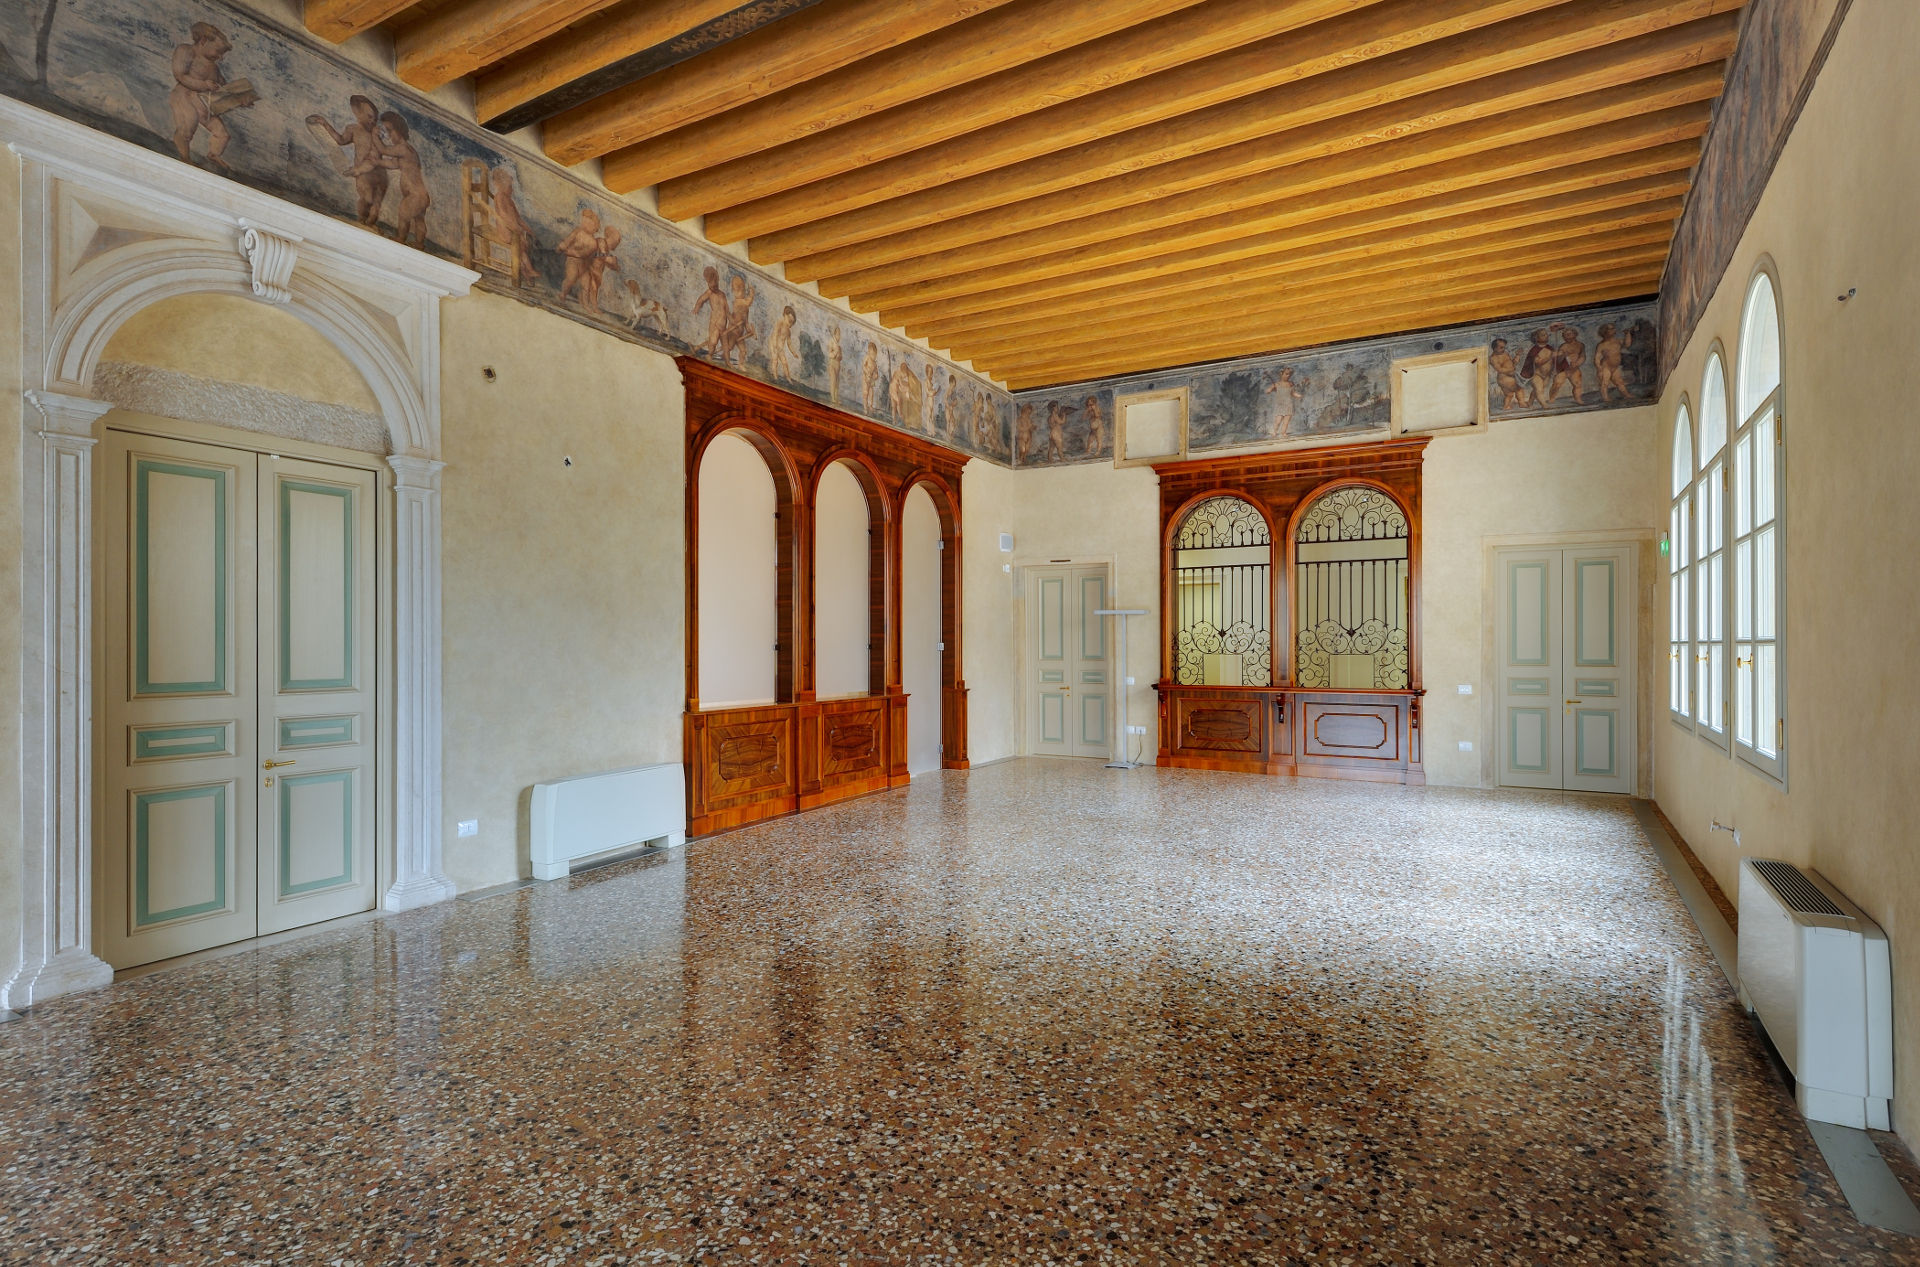 Palazzo Dondi dall'Orologio - image 3